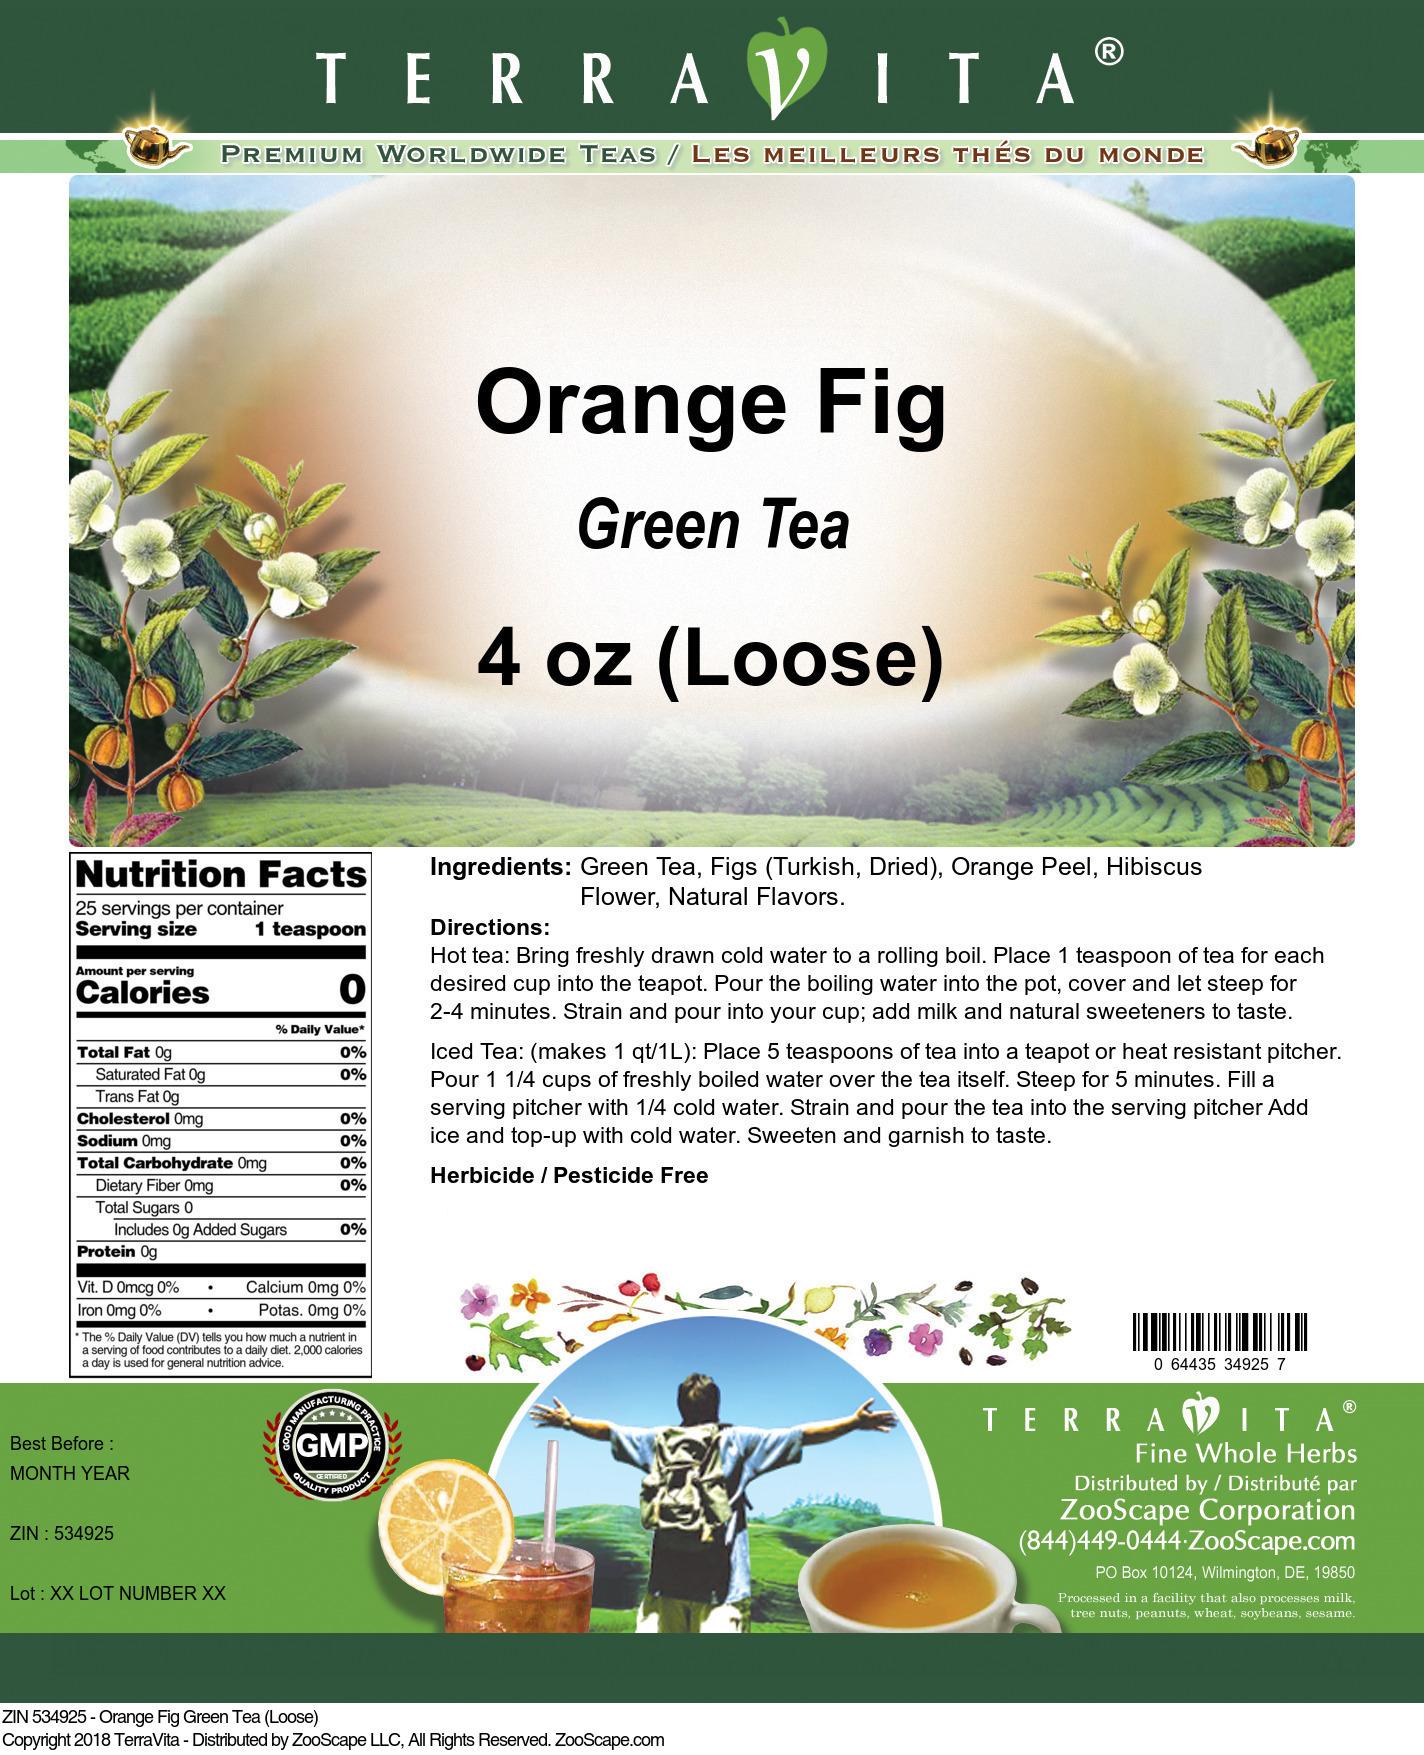 Orange Fig Green Tea (Loose)